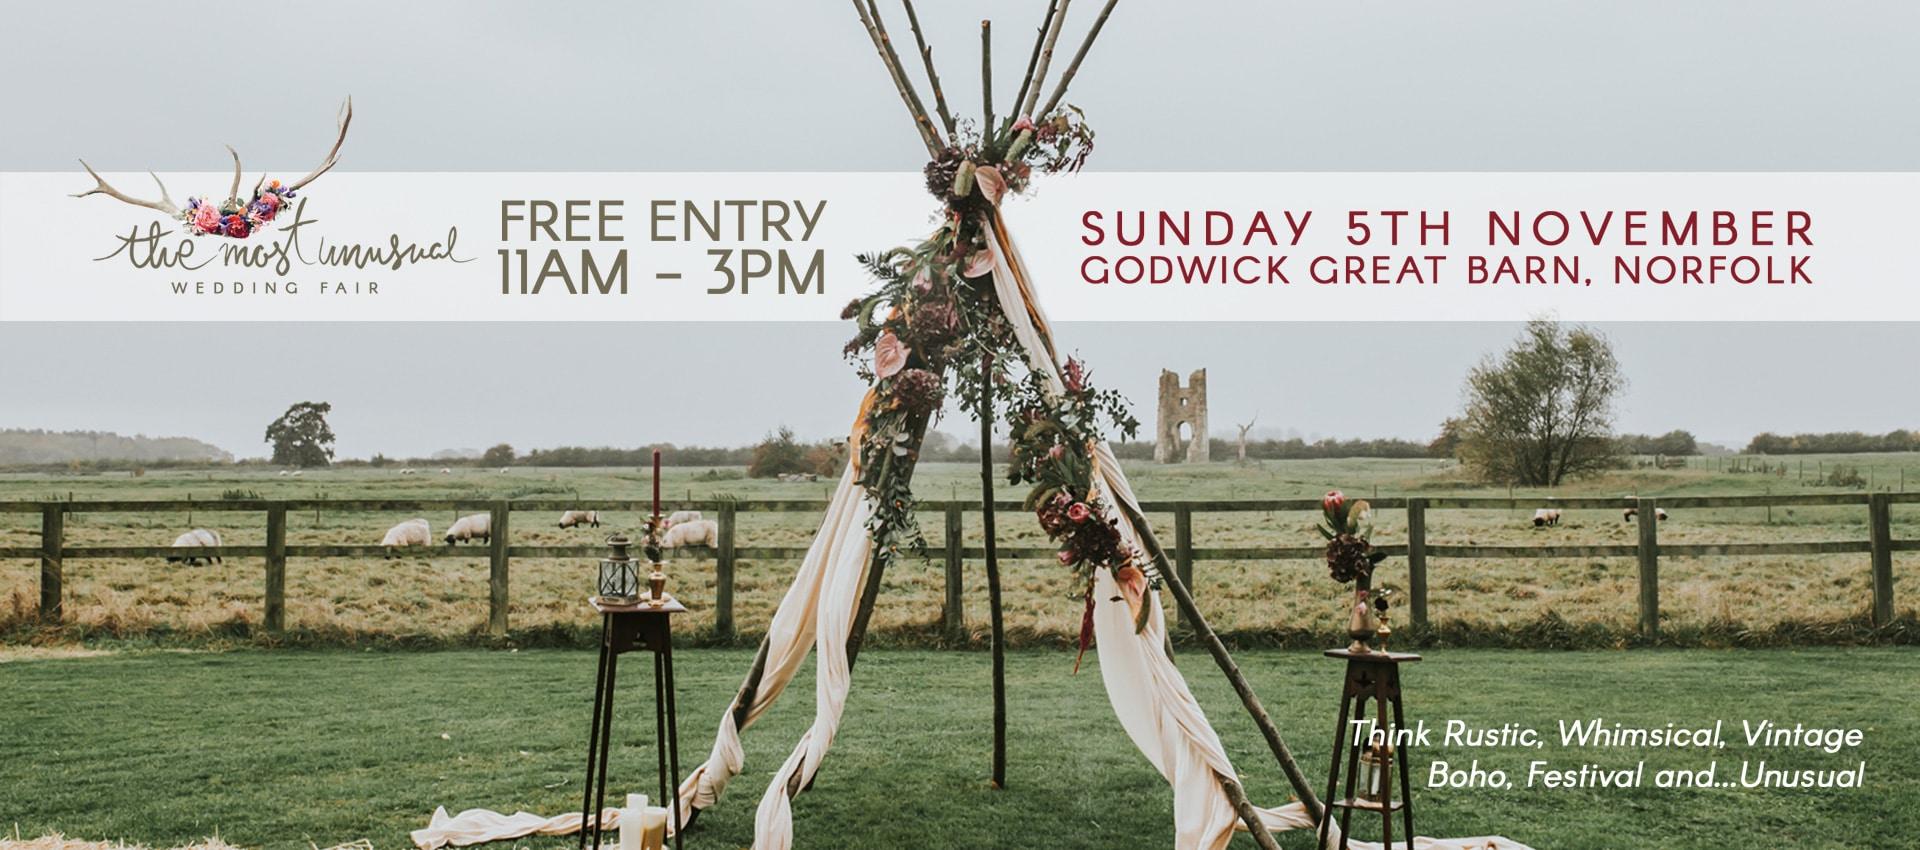 The-Most-Unusual-Wedding-Fair-Godwick